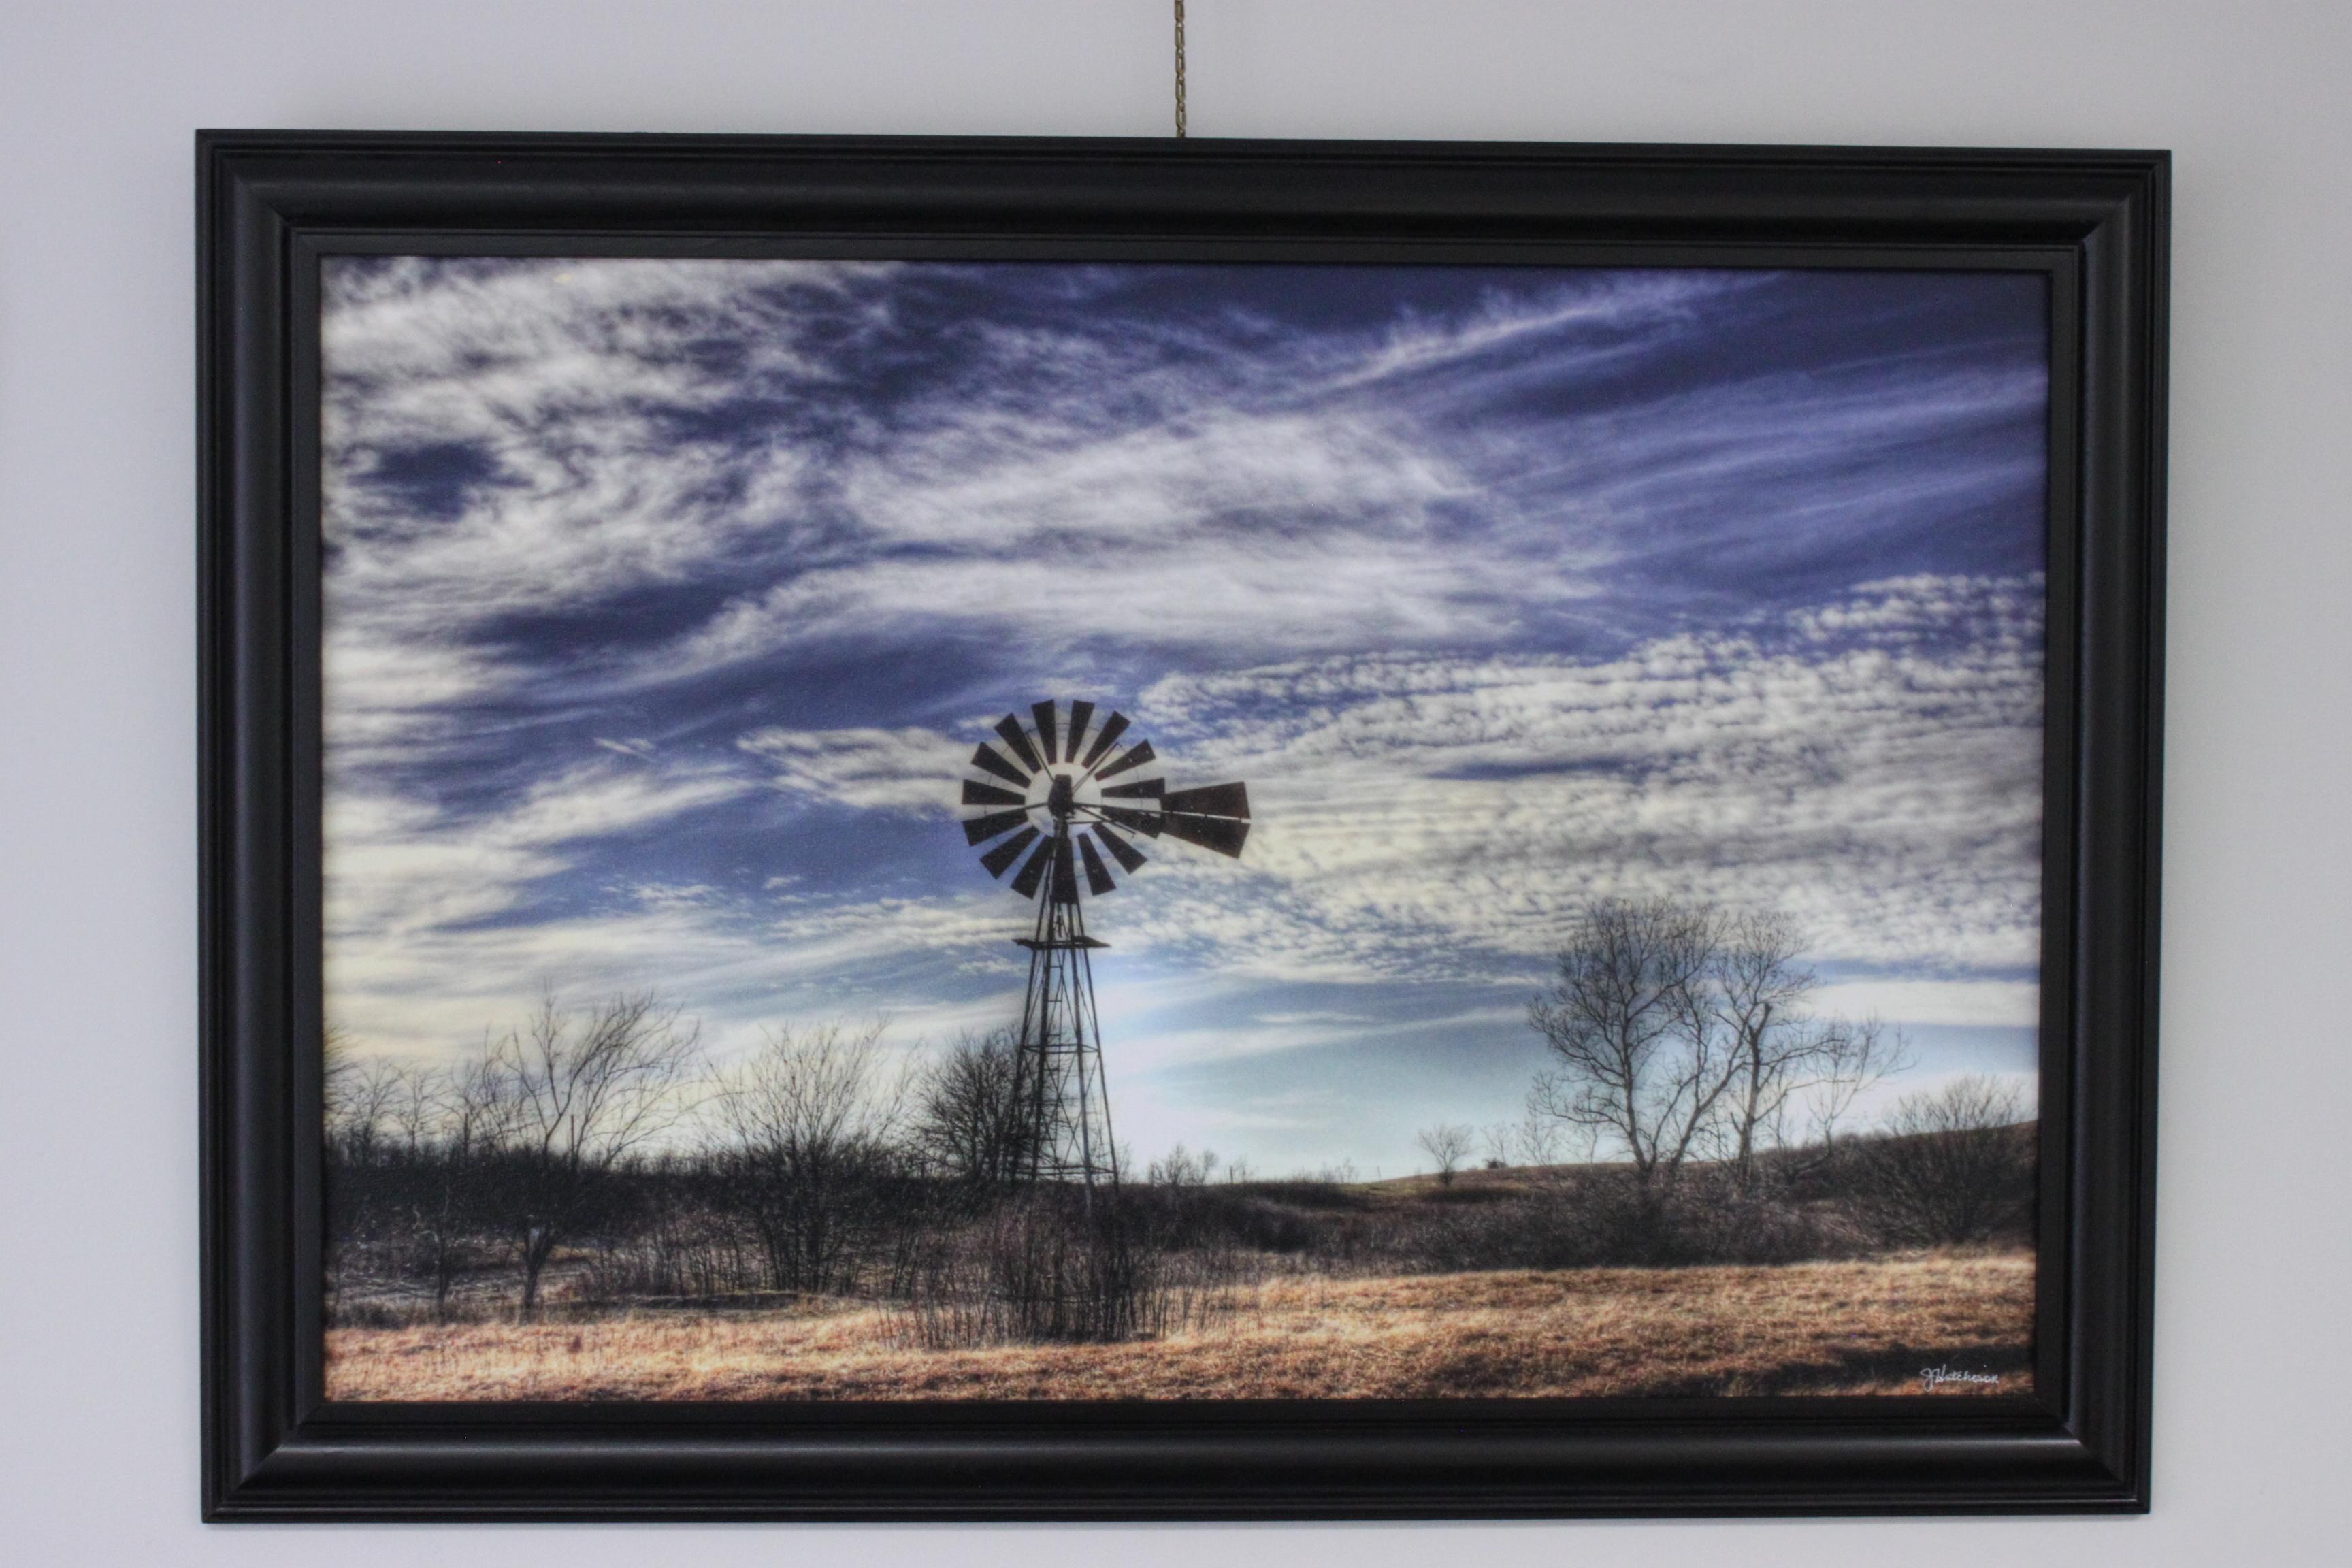 Windmill in the Flint Hills, Wabaunsee County, KS